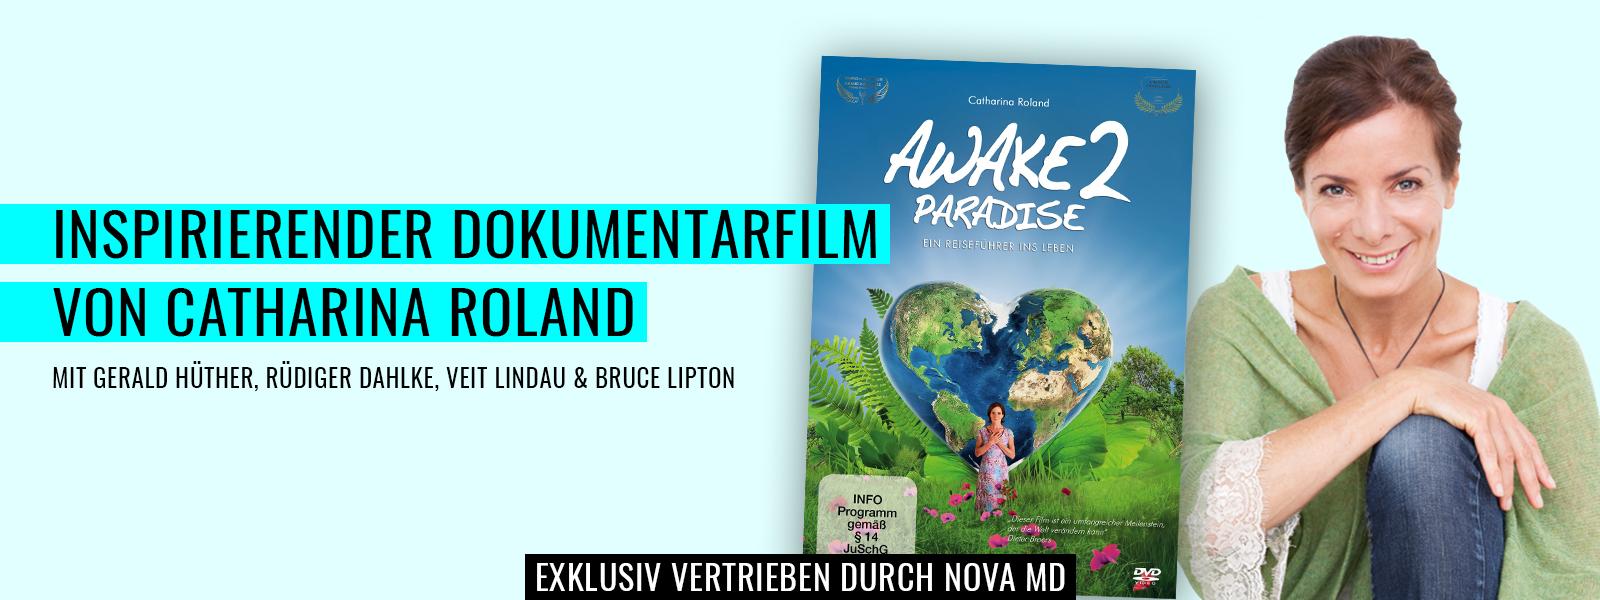 "Dokumentarfilm von Catharina Roland: ""Awake 2 Paradise"""